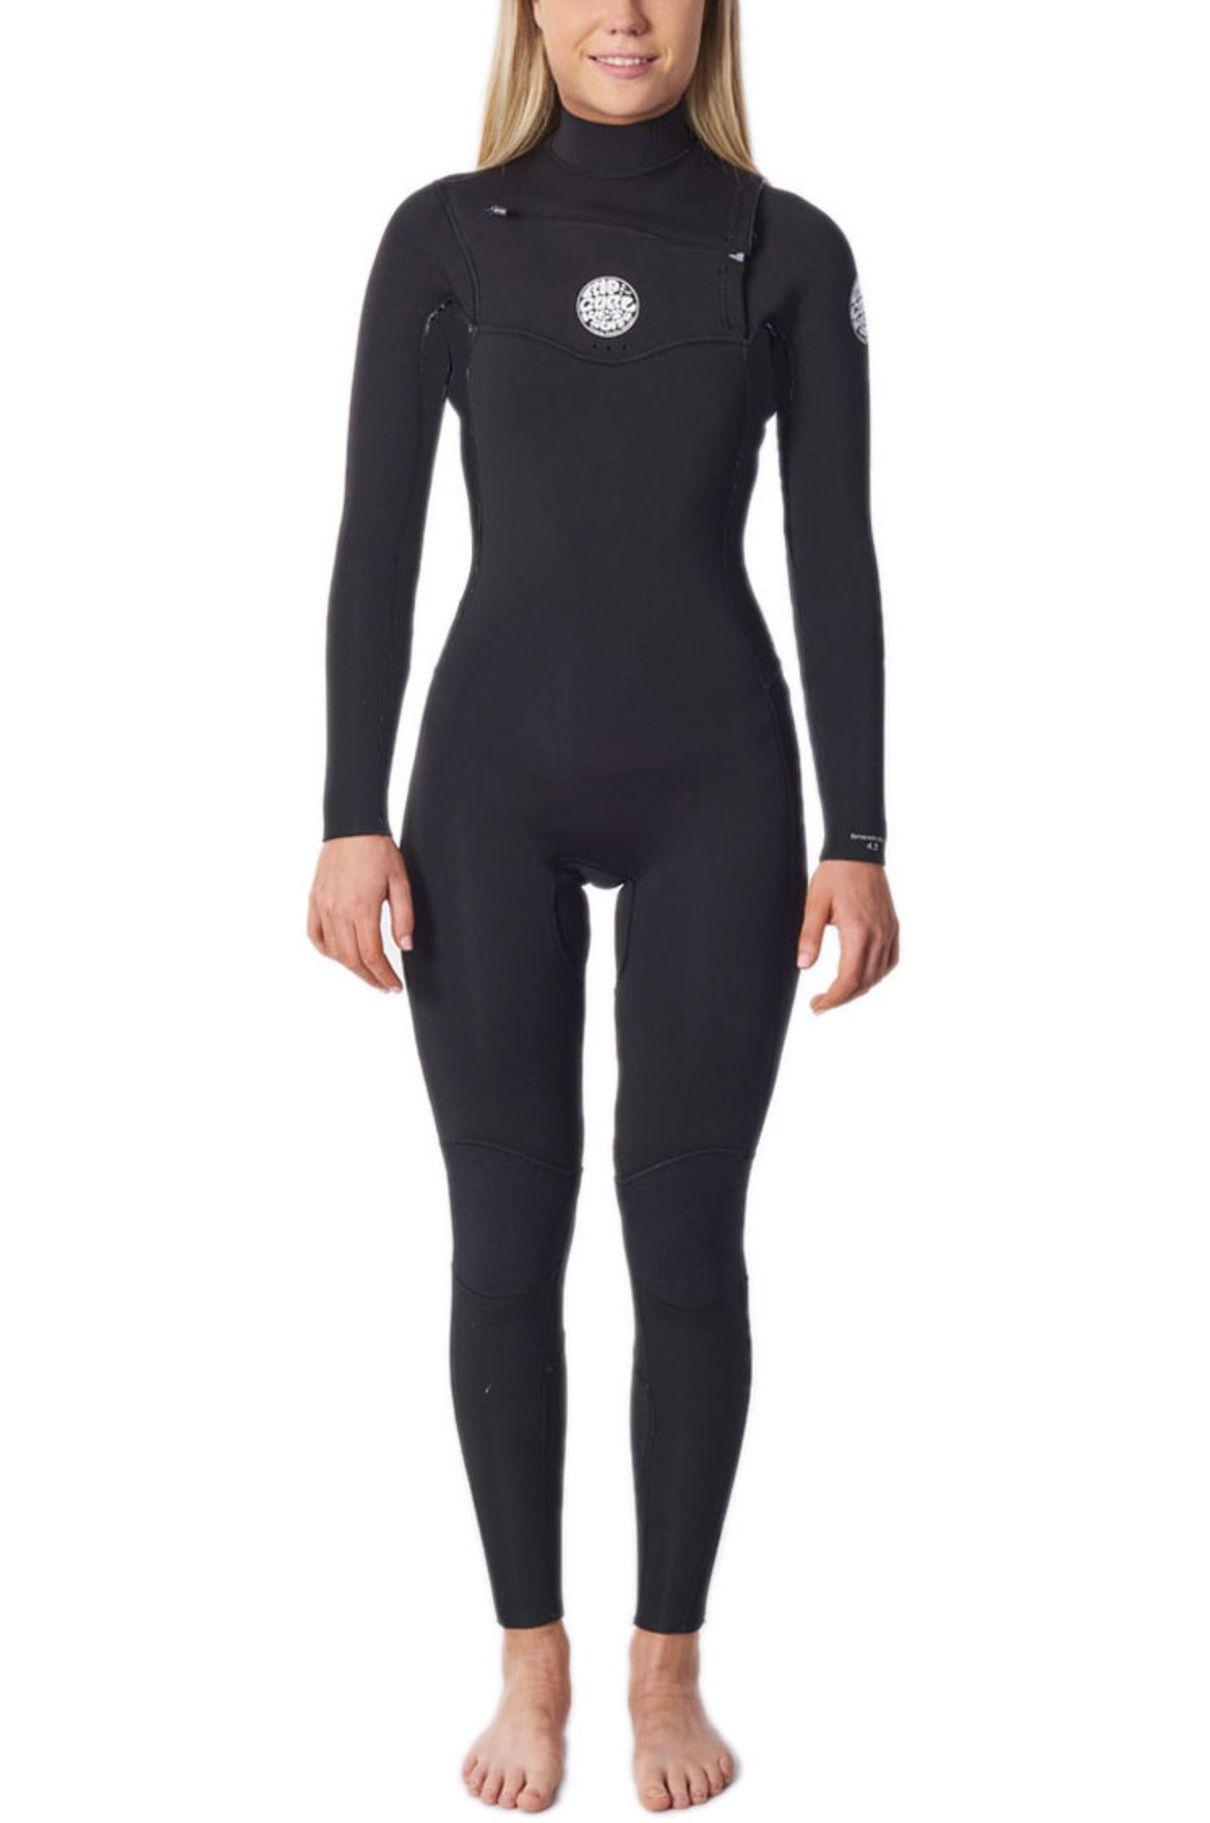 Rip Curl Wetsuit WMS DAWN PATROL 4/3 CZ GB Black 4x3mm